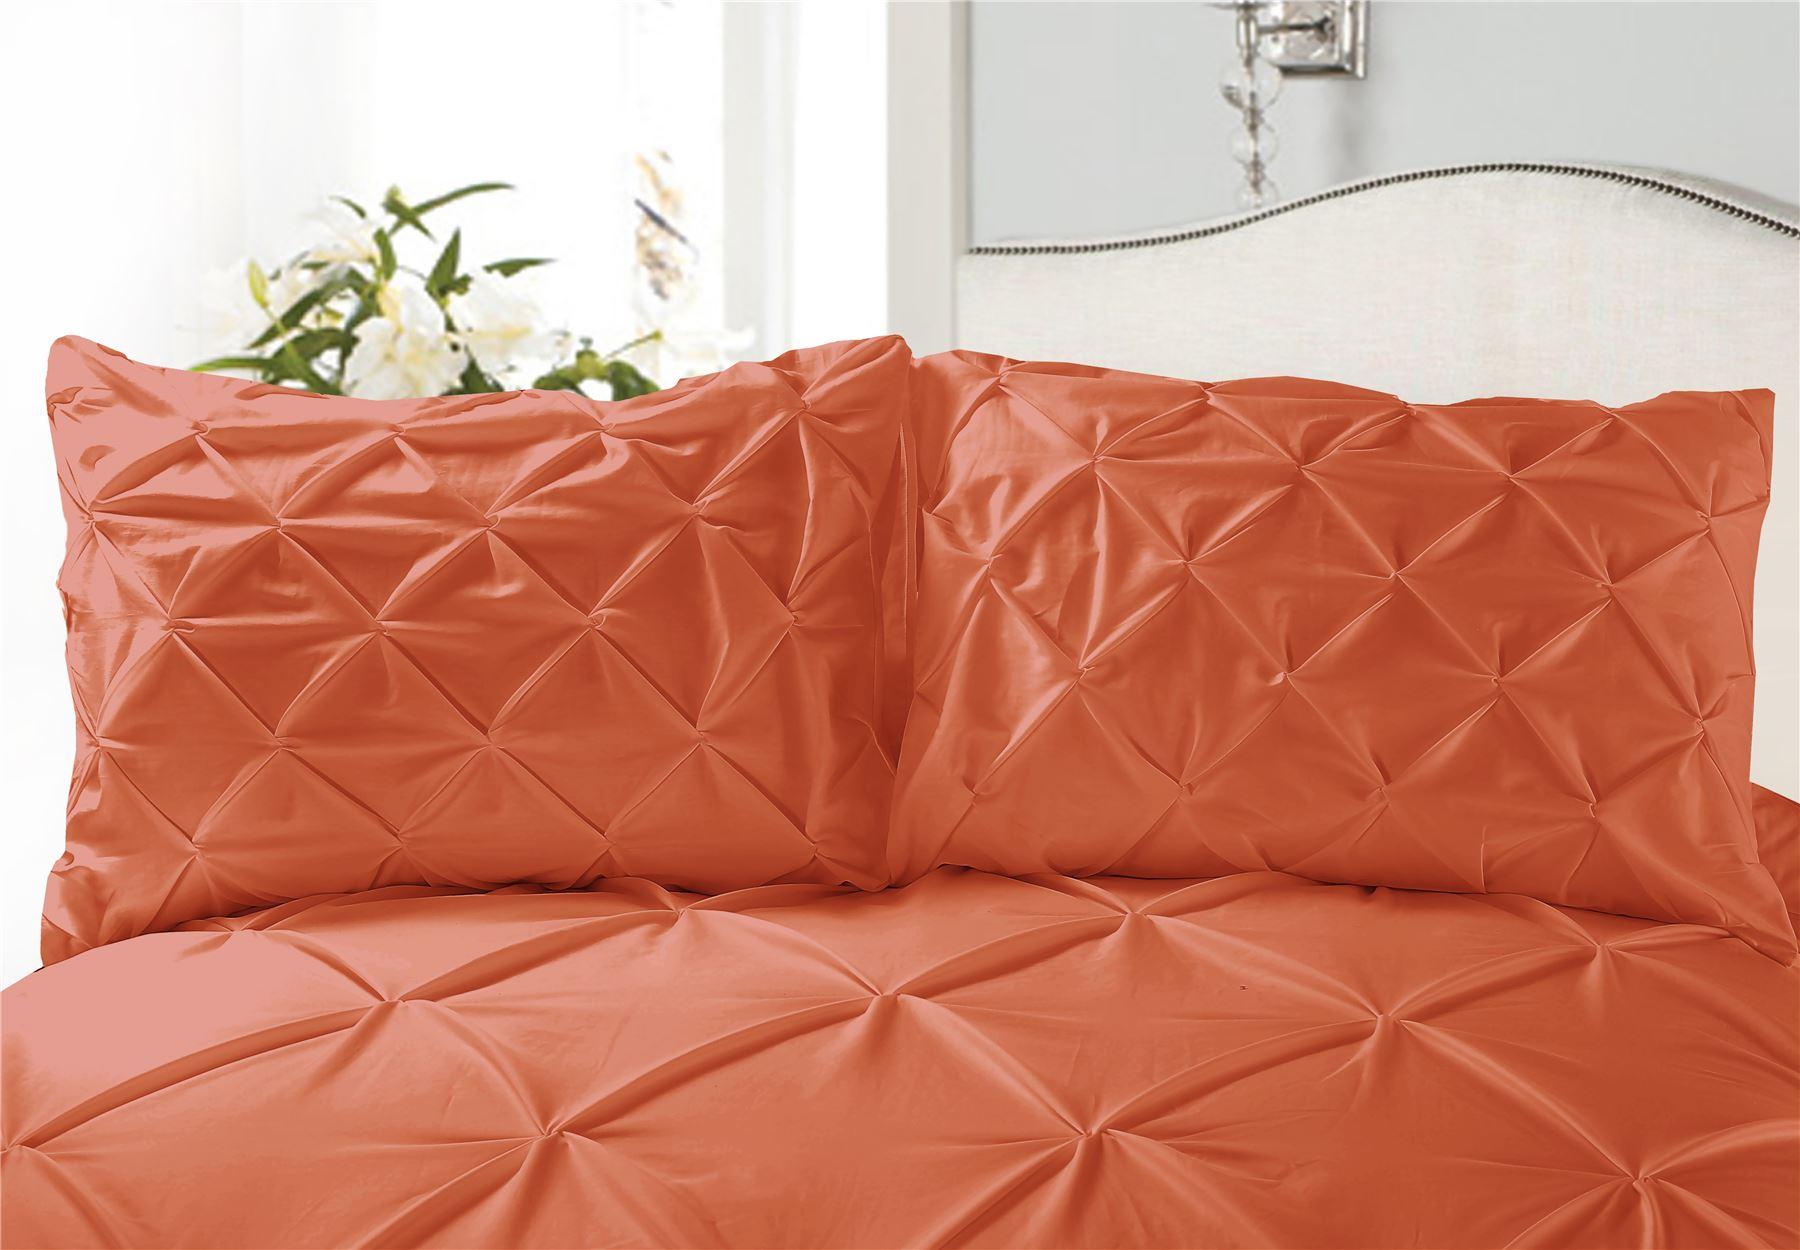 Luxury-Pure-100-Cotton-200-Thread-Pinch-Pleat-Pintuck-Puckering-Duvet-Cover-Set thumbnail 24